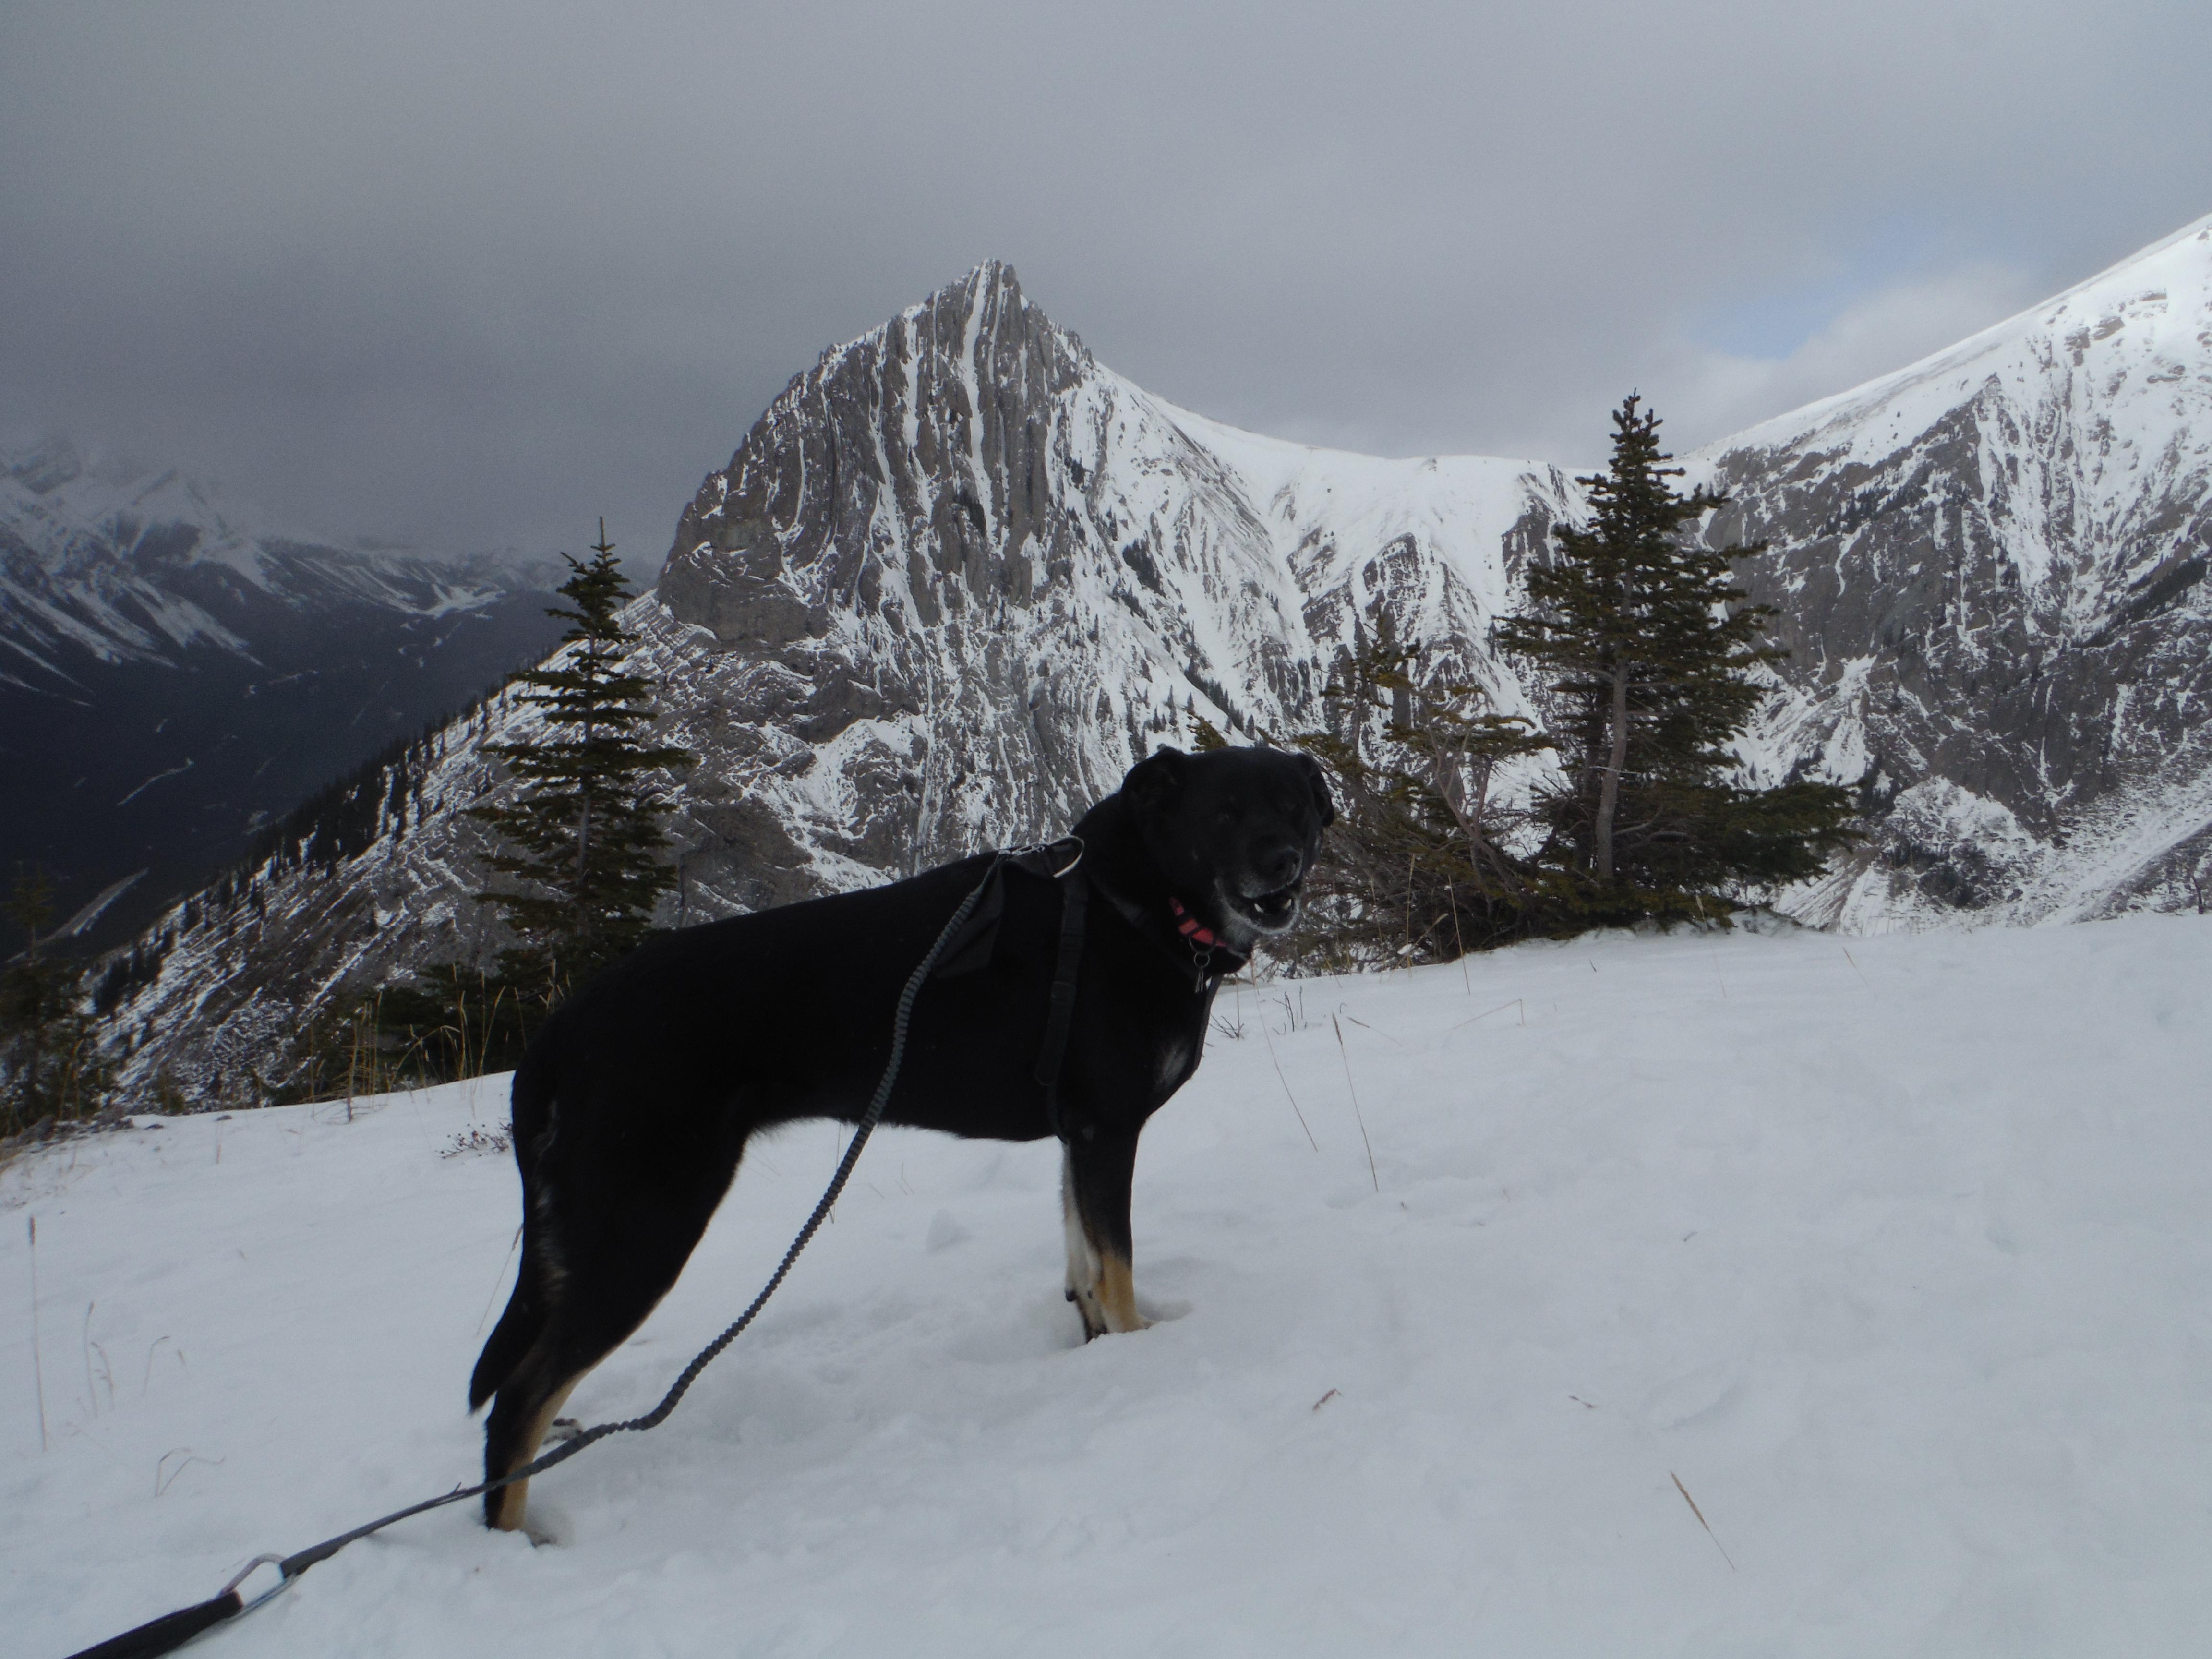 Kona Packenham Jr. Grizzly Peak